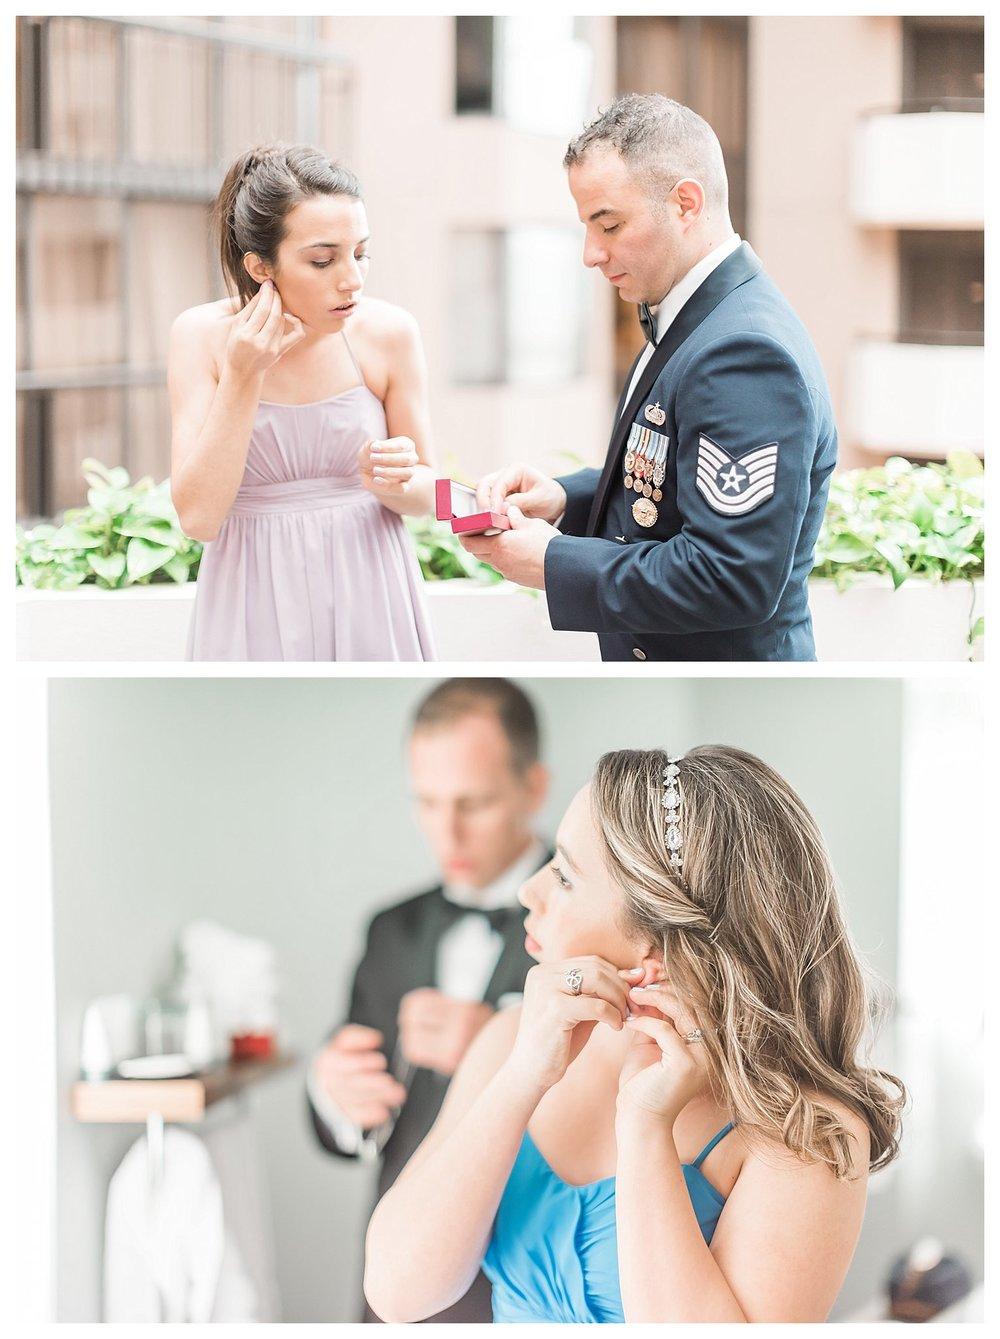 LGBTQ DC War Memorial Wedding | Andrea Rodway Photography